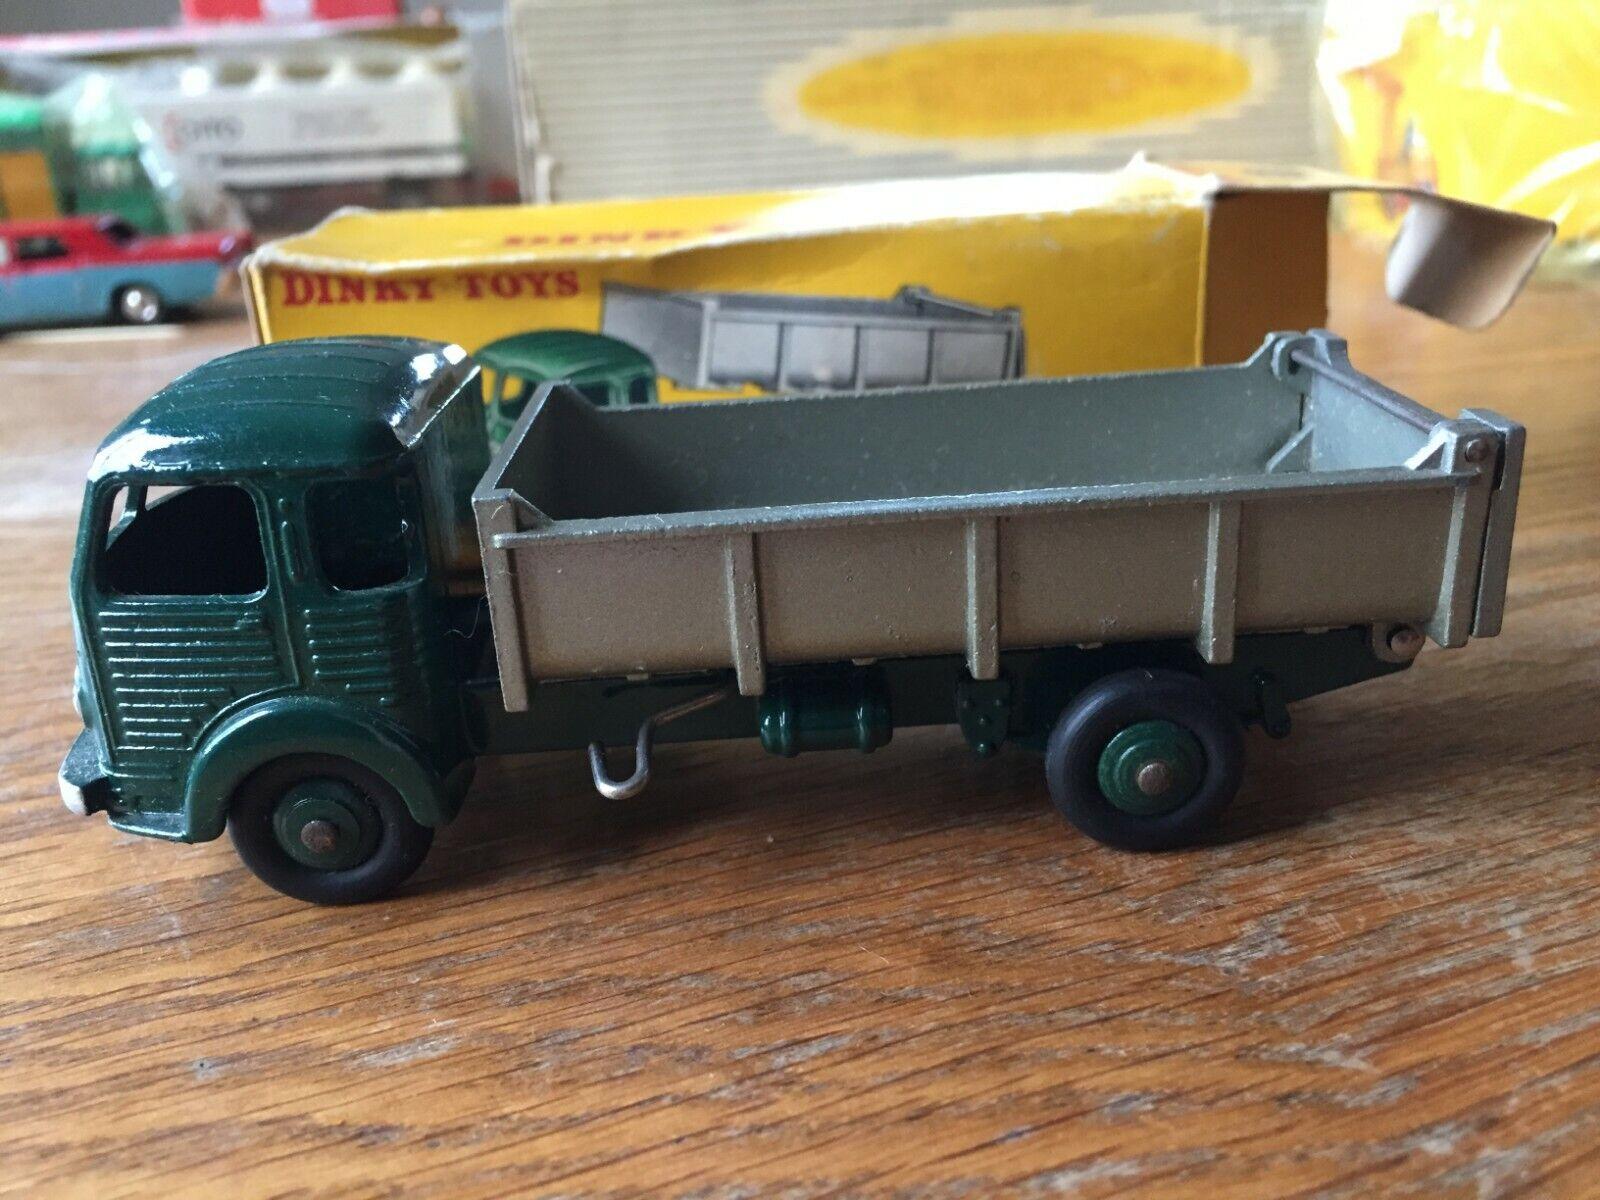 Dinky toys F n° 33 B camion Simca cargo benne basculante en boite